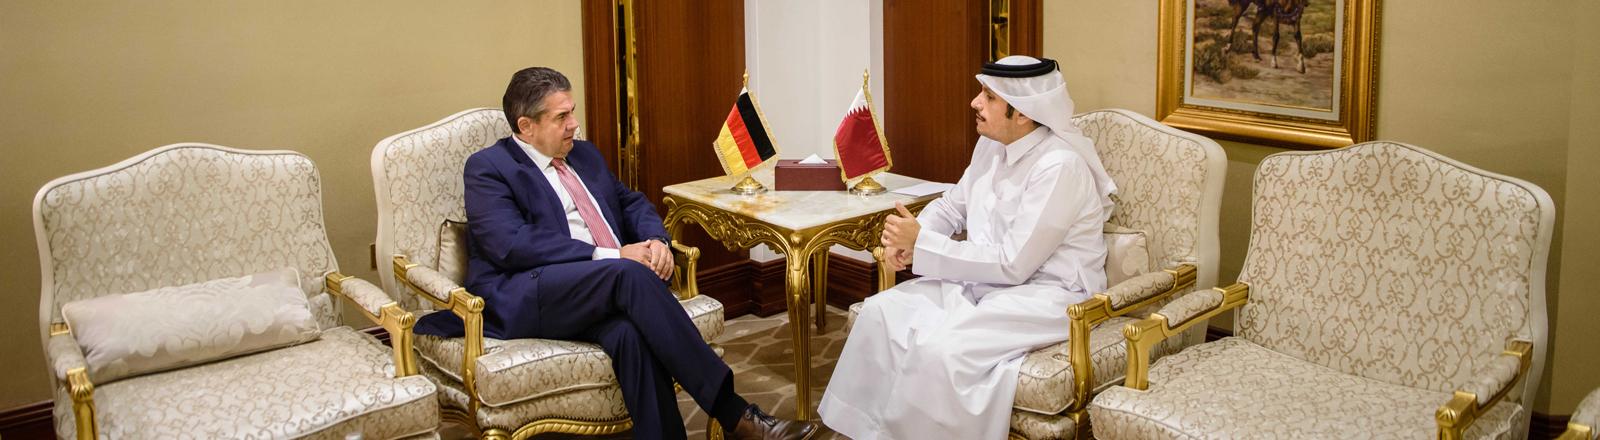 Katar-Verhandlungen